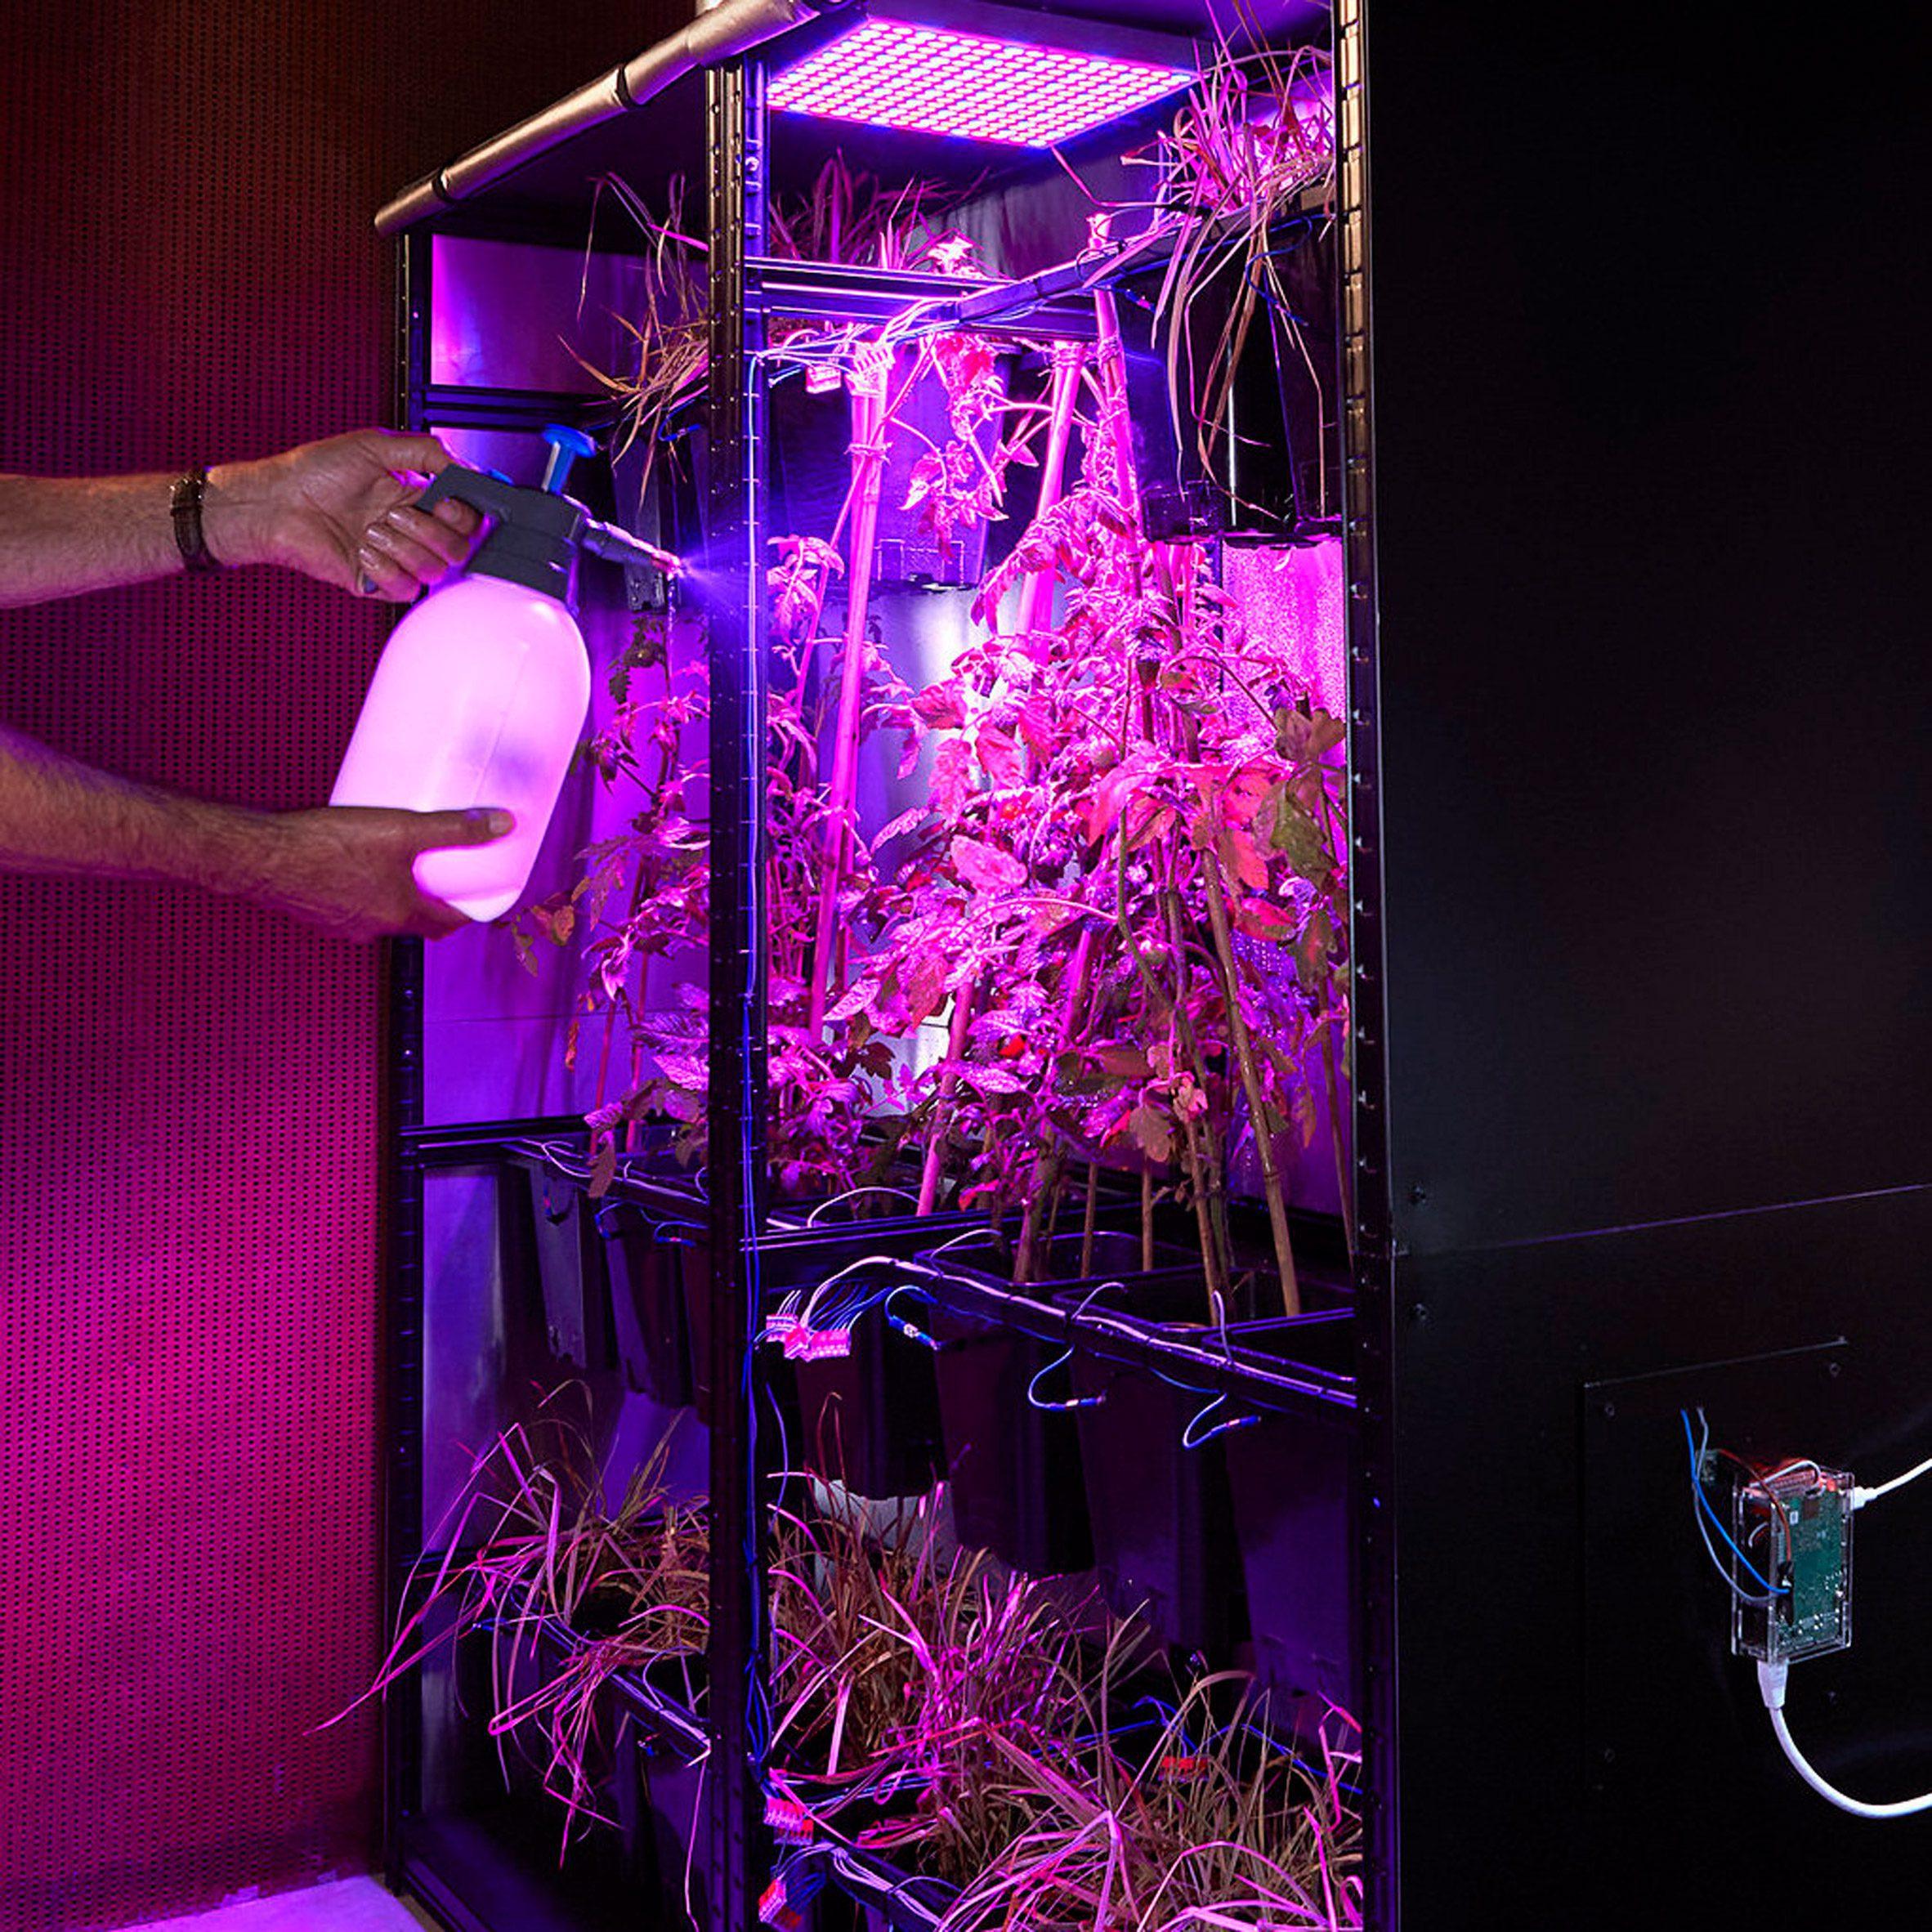 Ilja Schamle powers server with tomato plants in self-sustaining ecosystem